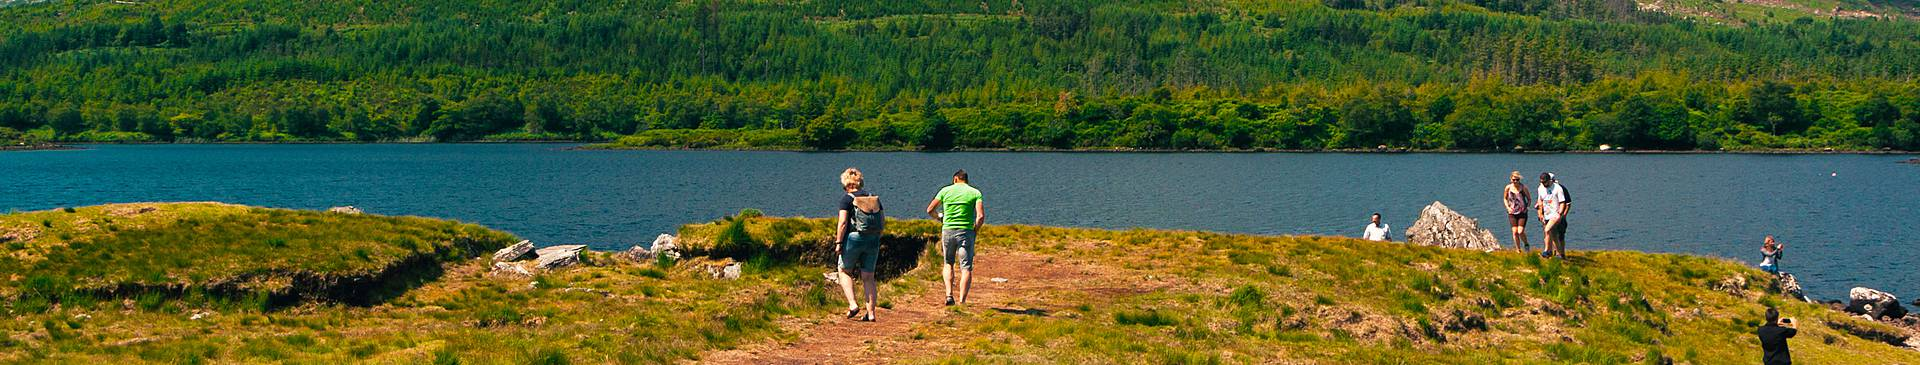 Viaggi di gruppo in Irlanda